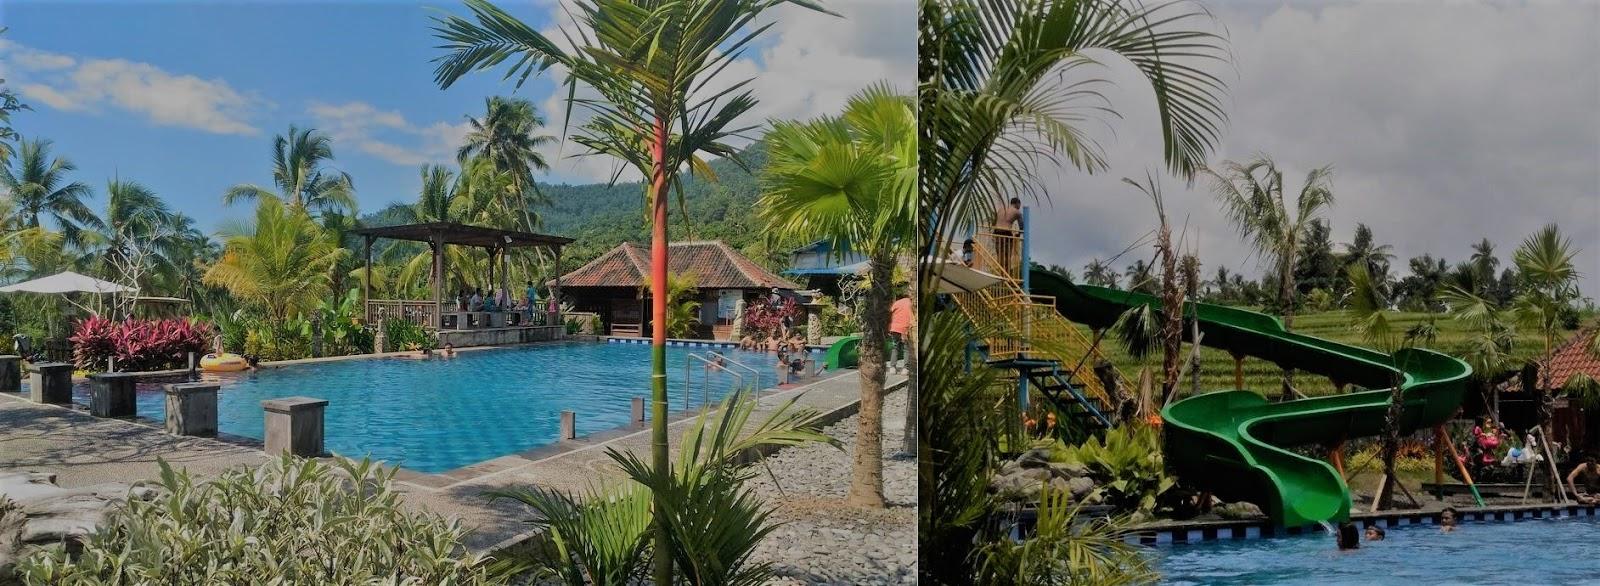 alamandoe pool water park  singaraja